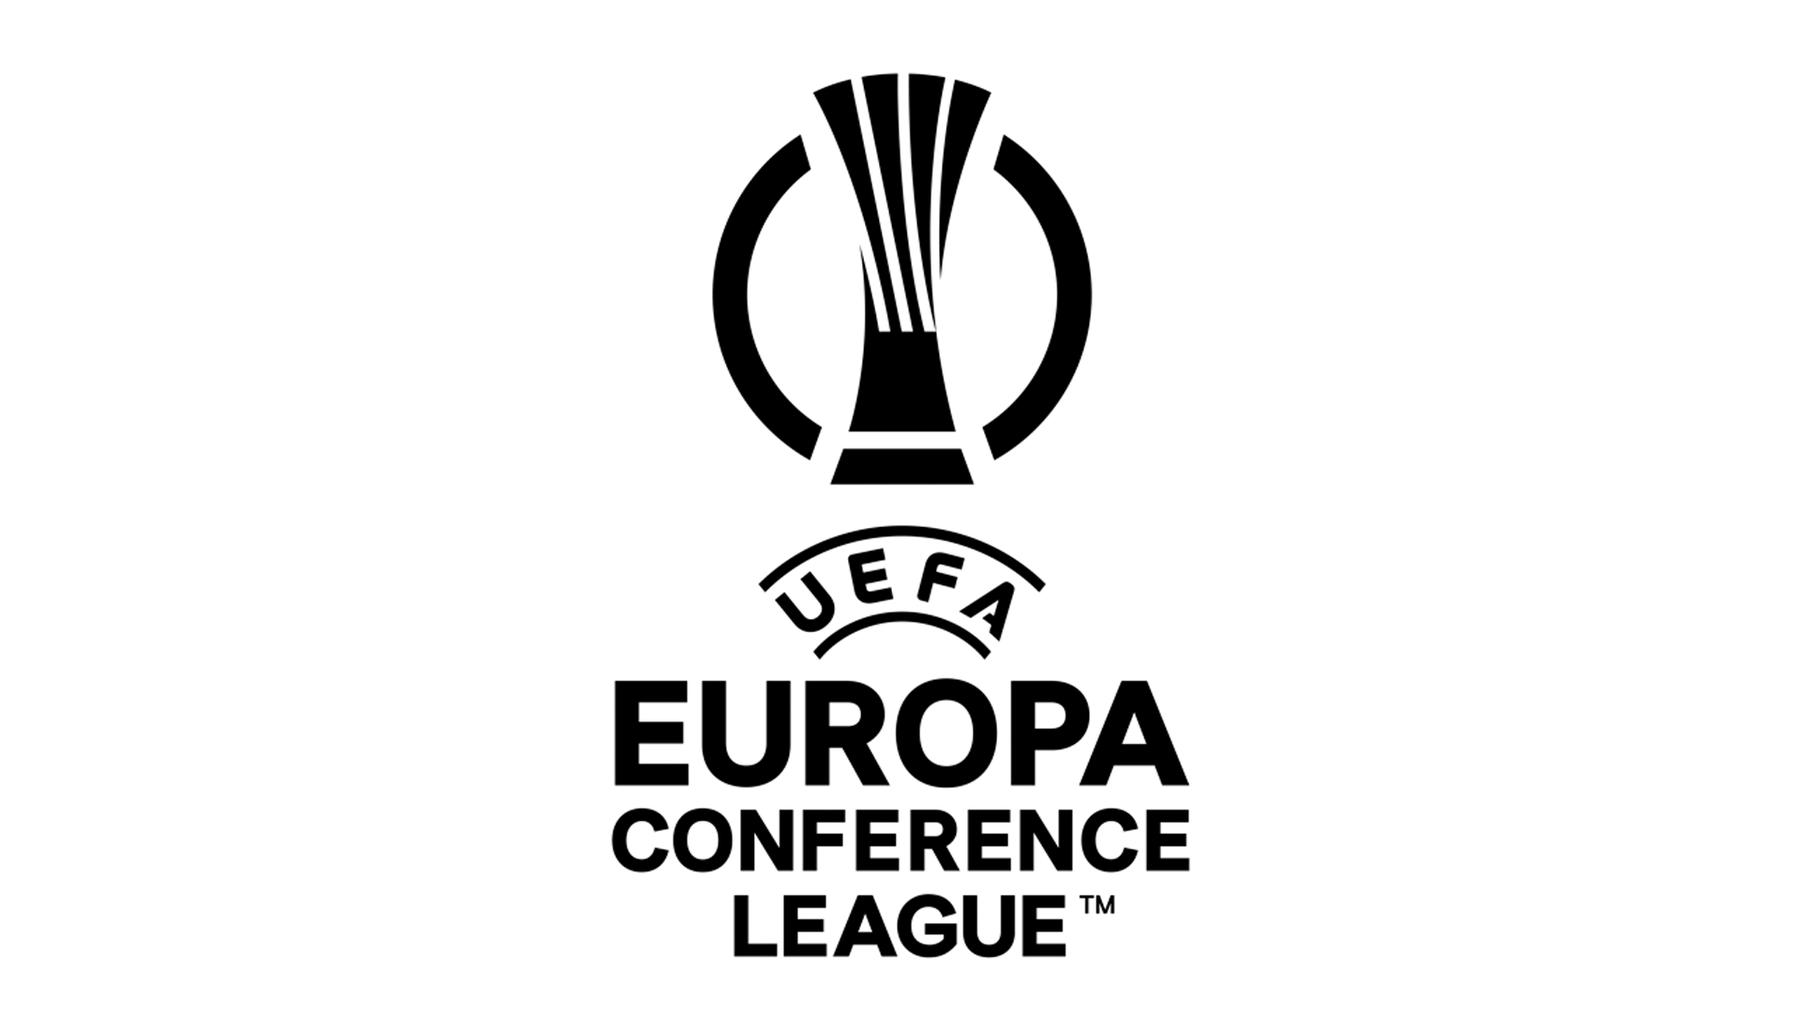 Europa Conference League